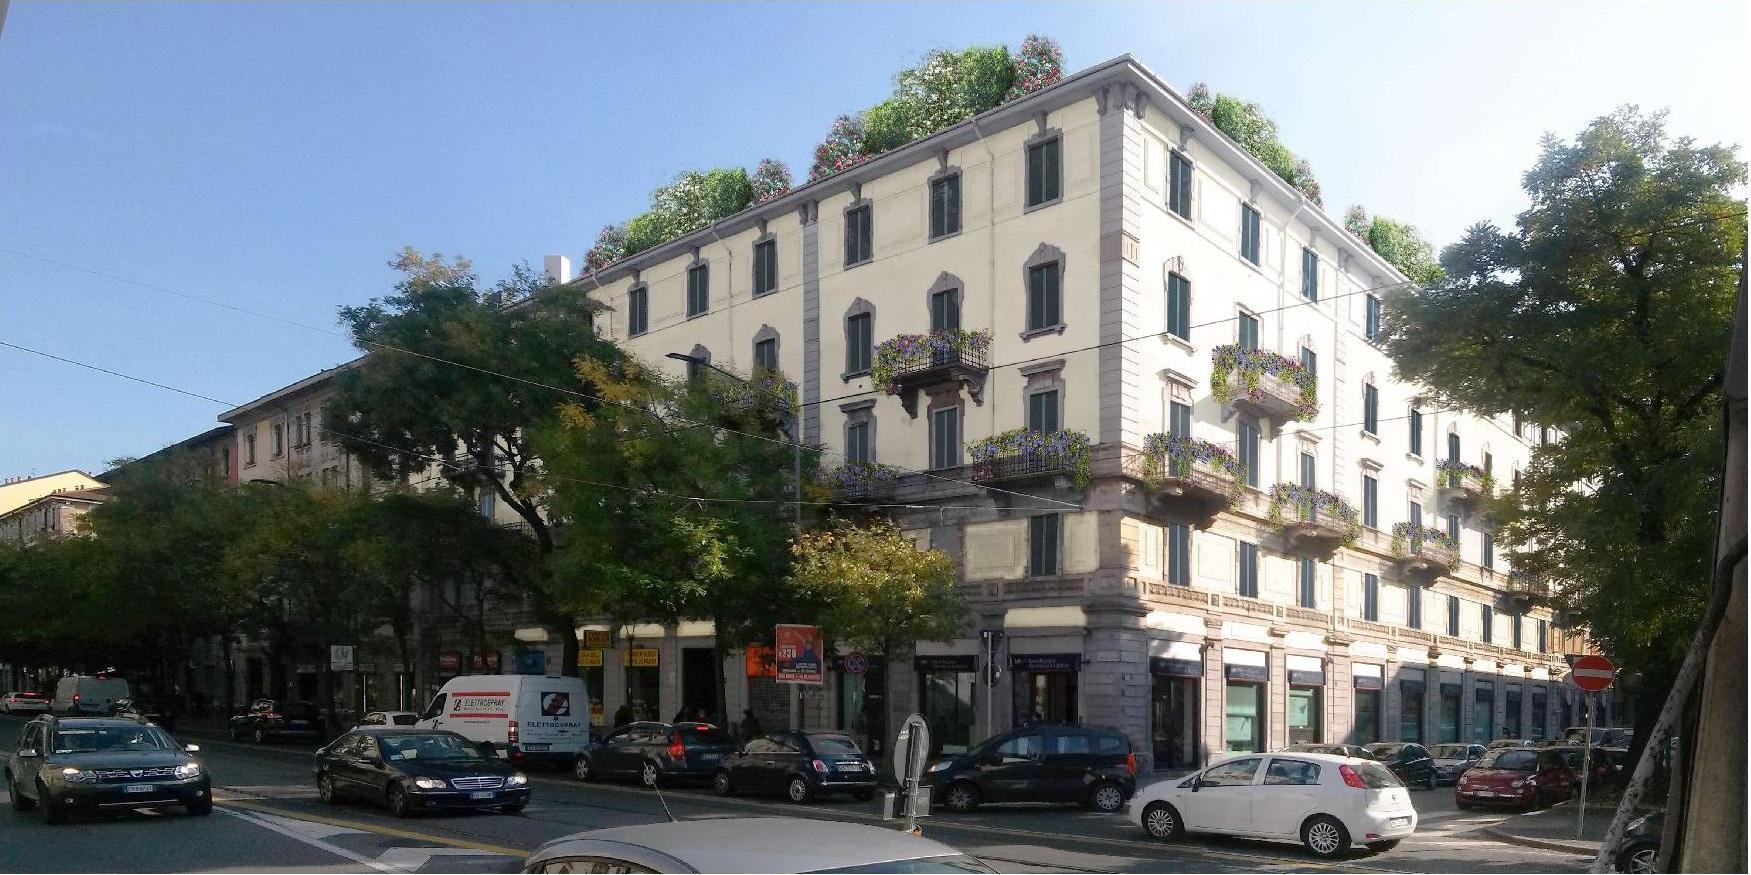 Cohousing in C.so XXII marzo Milano